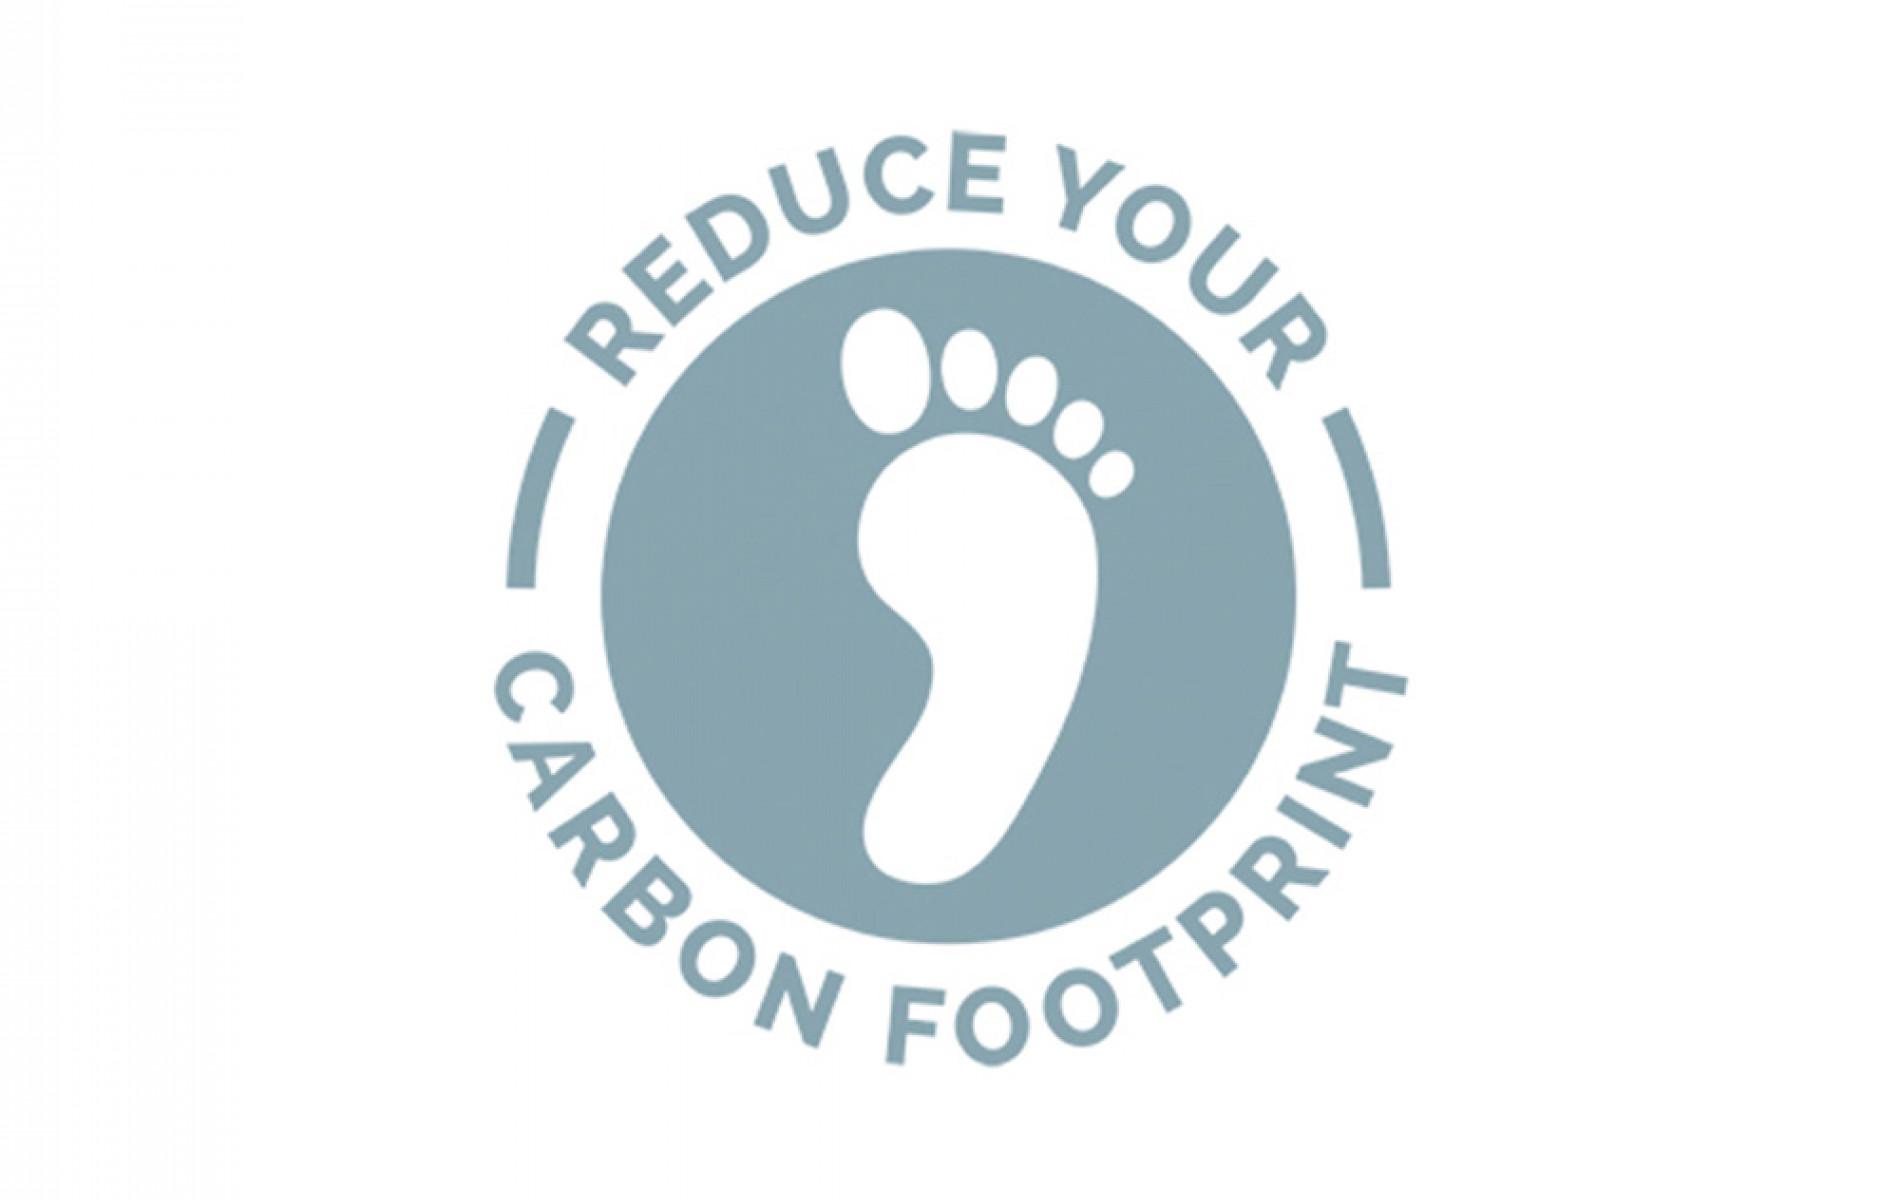 News Carbon Footprint